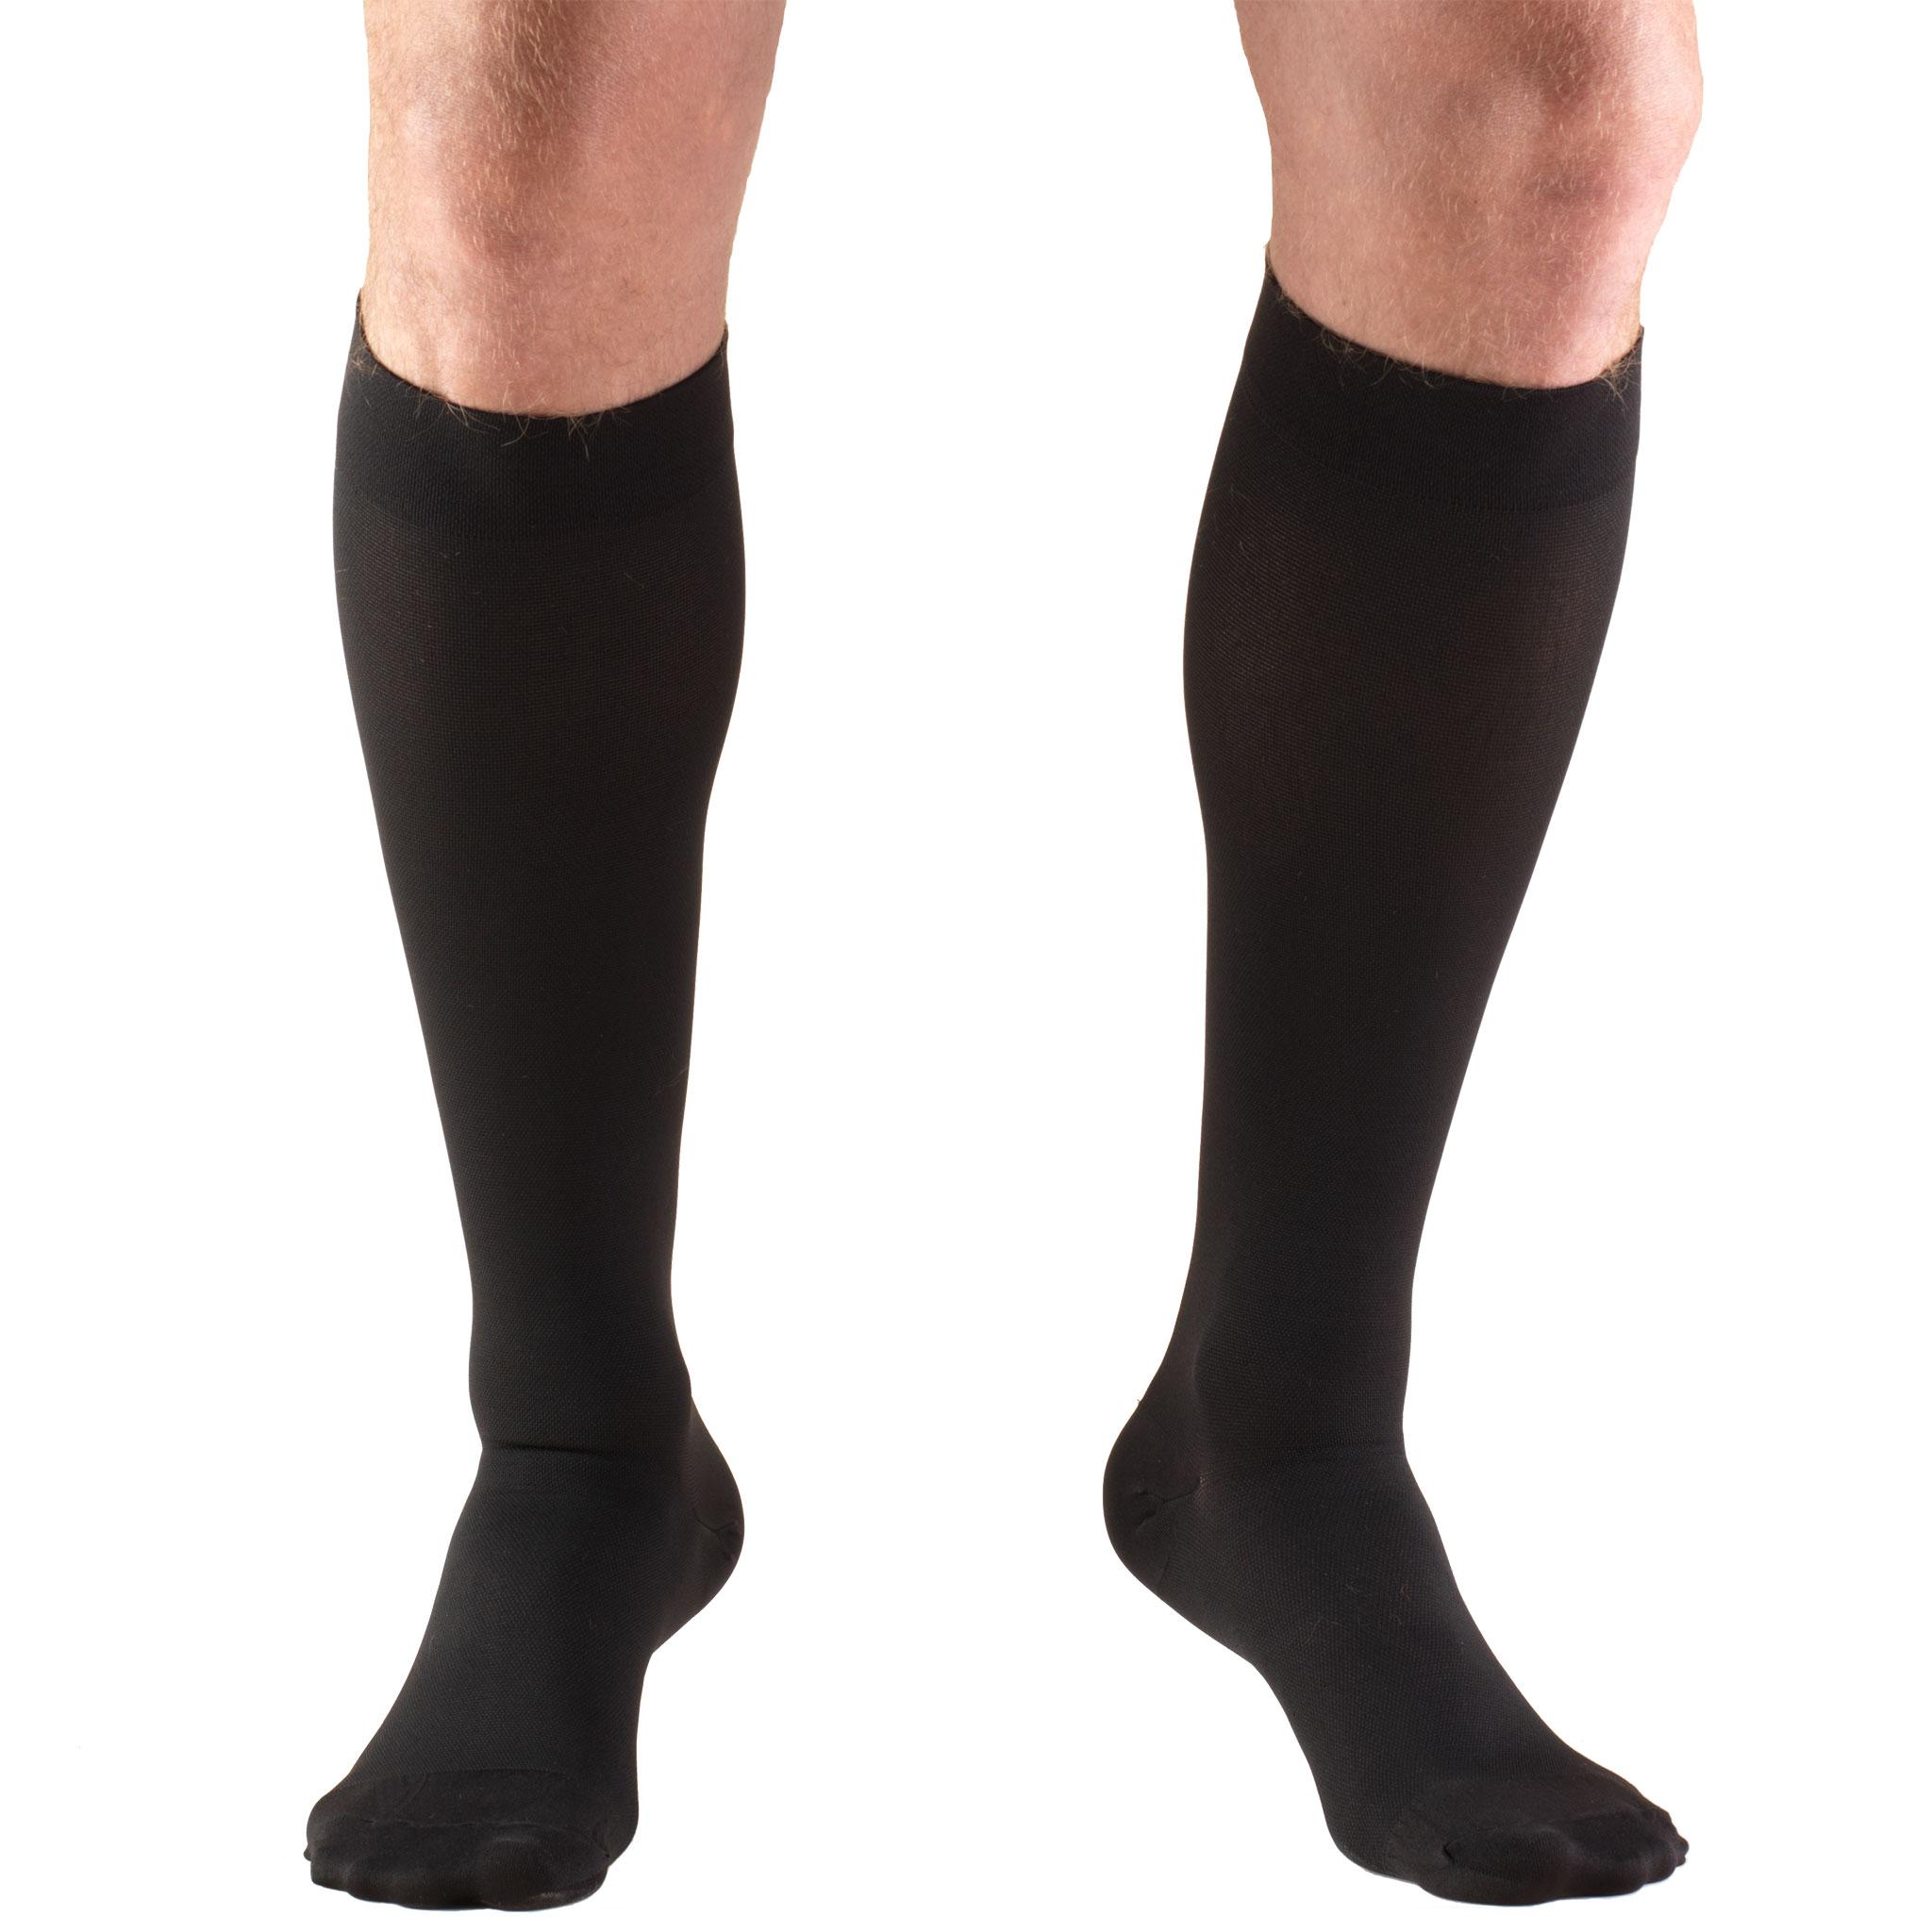 Truform Stockings, Knee High, Closed Toe: 30-40 mmHg, Black, Large